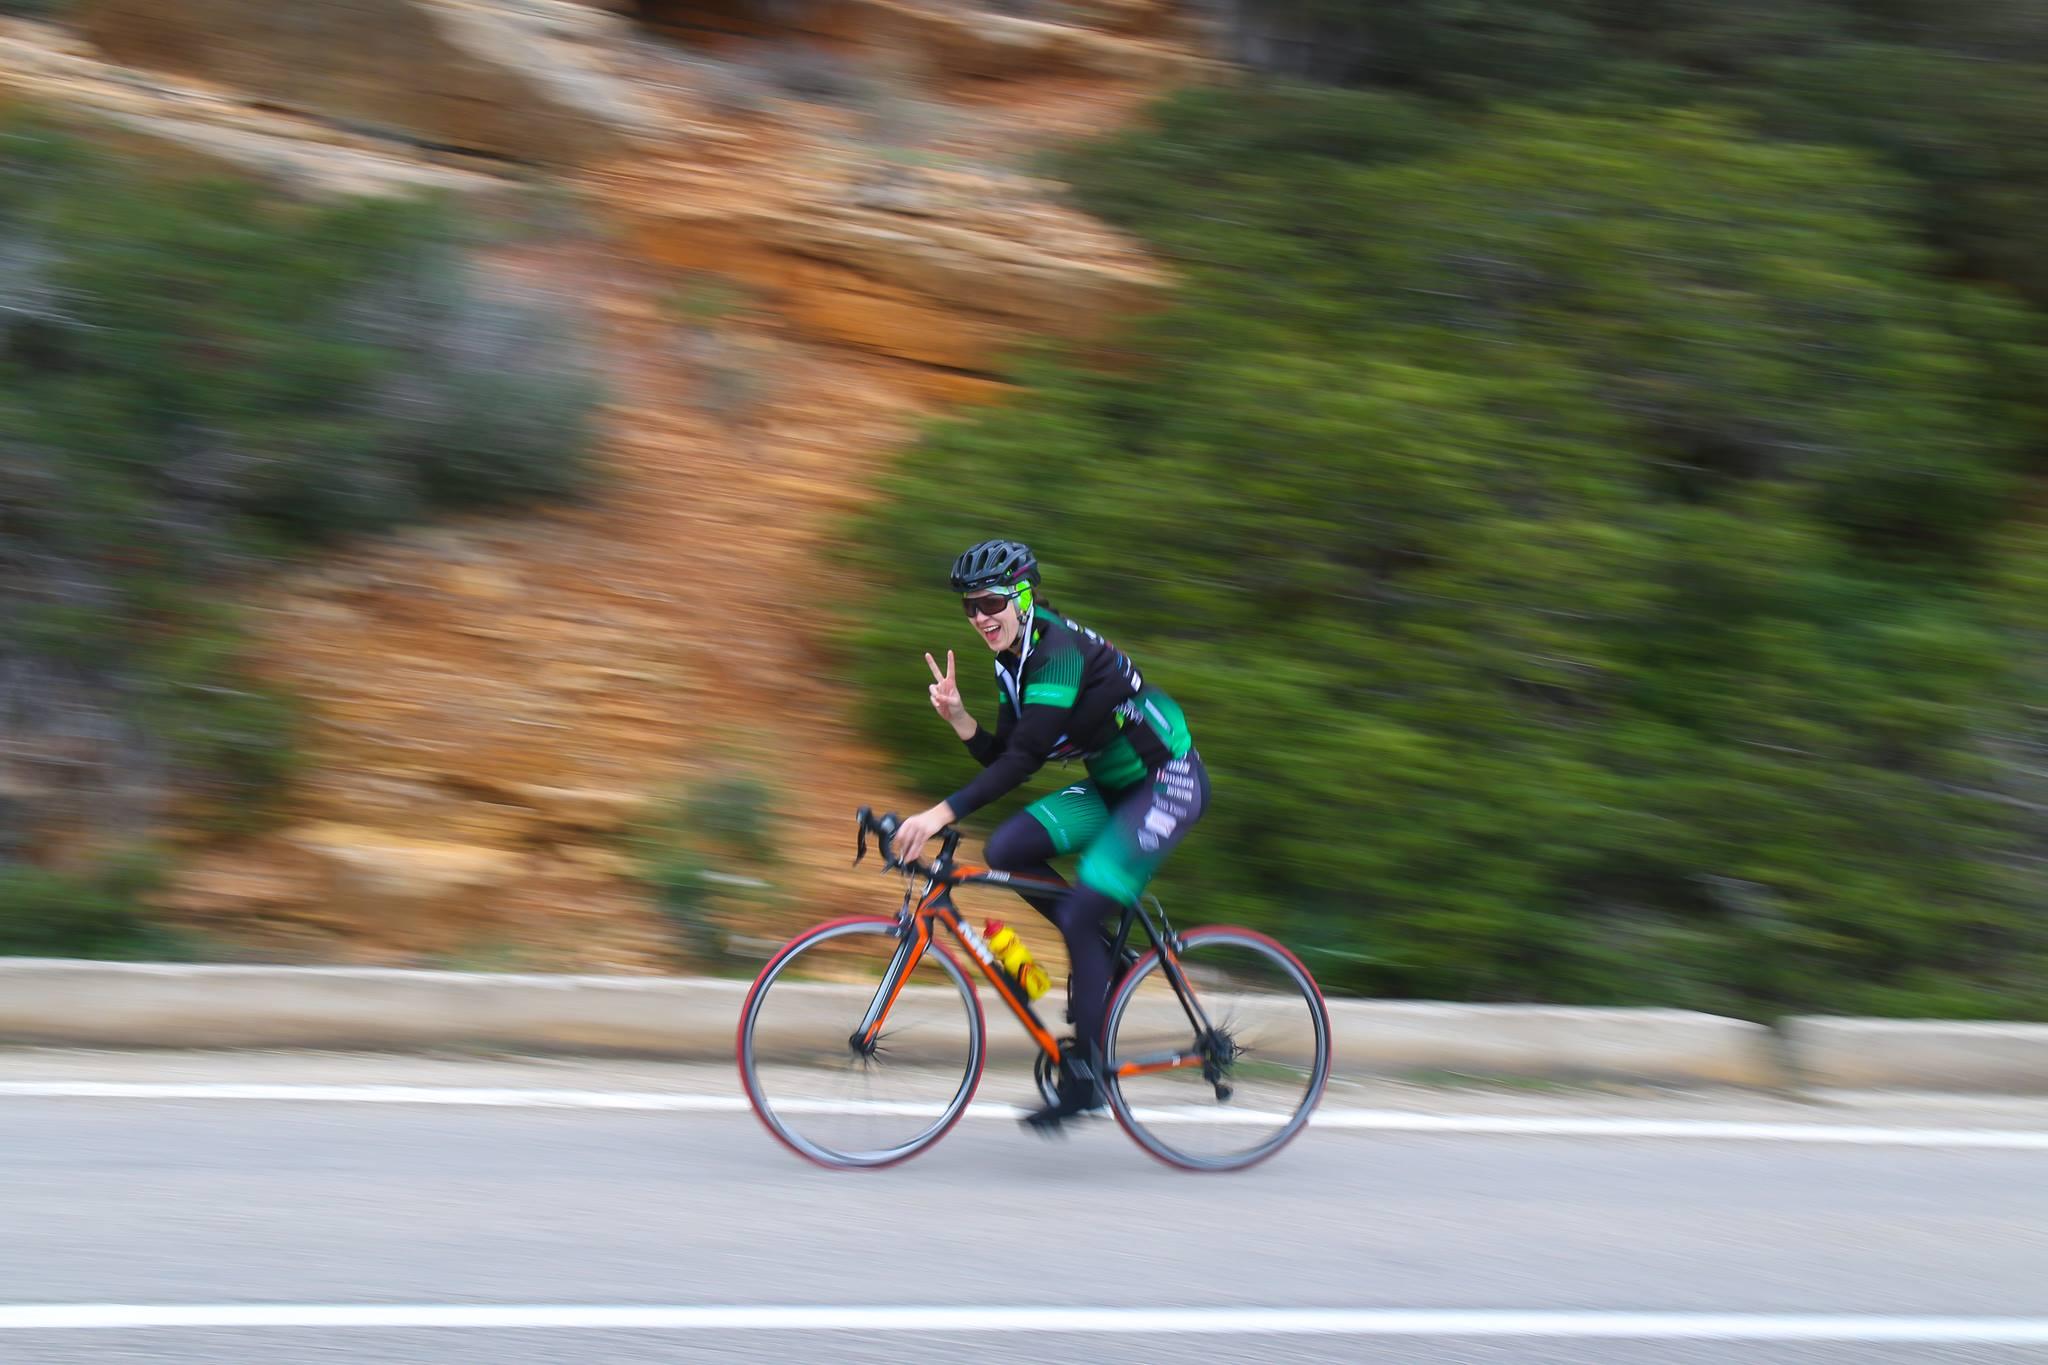 2017: Cantonament de Ciclism in Sardinia